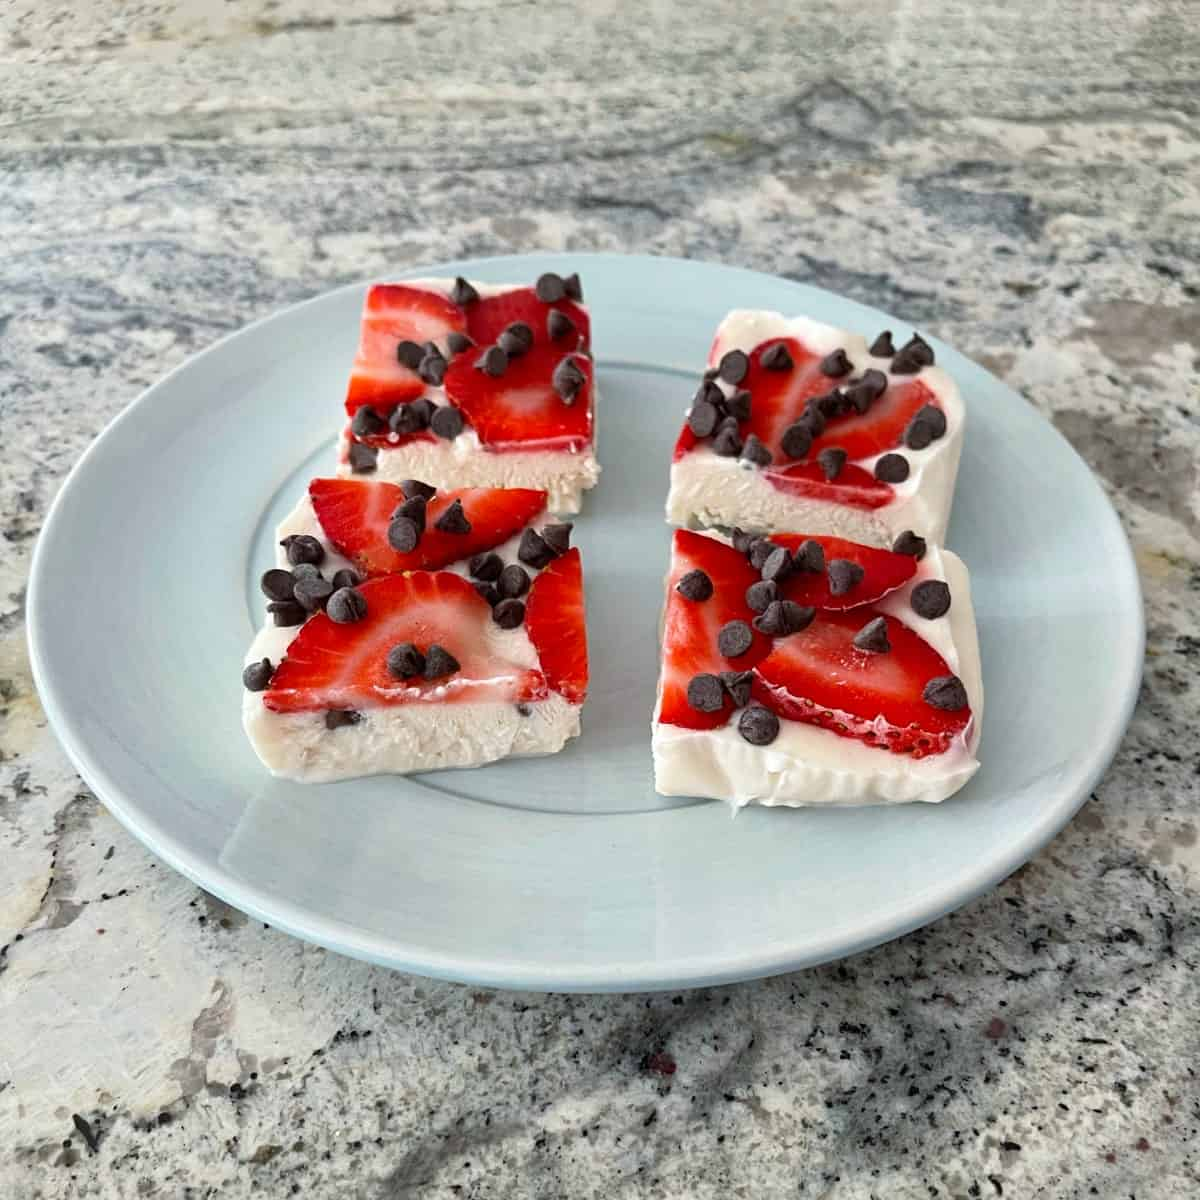 Four pieces strawberry chocolate chip frozen greek yogurt bark on blue plate on granite counter.